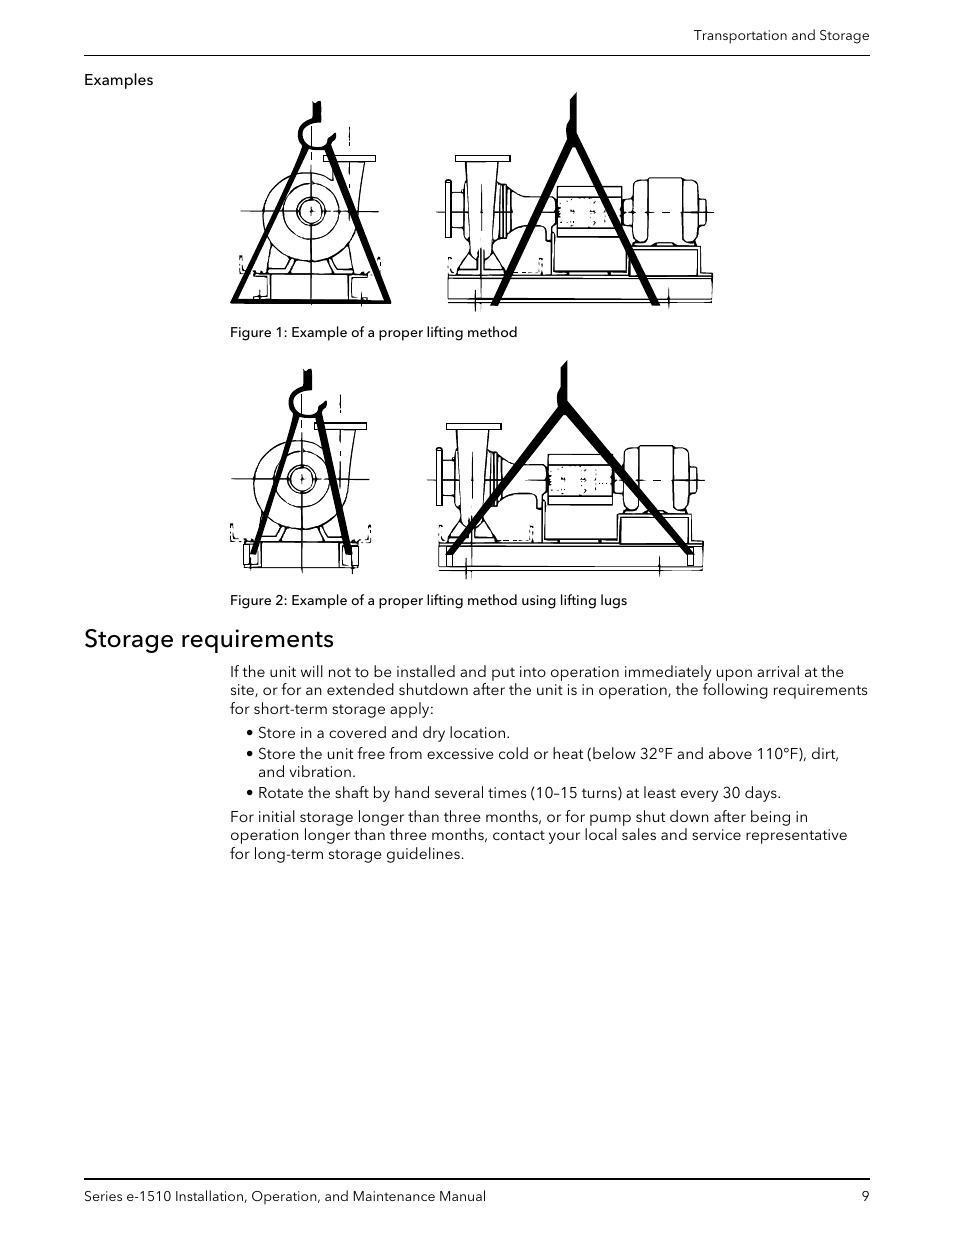 Bell Gossett Pumps Diagram Trusted Wiring Diagrams Amp Storage Requirements P2001406c Series E 1510 Moyno Pump